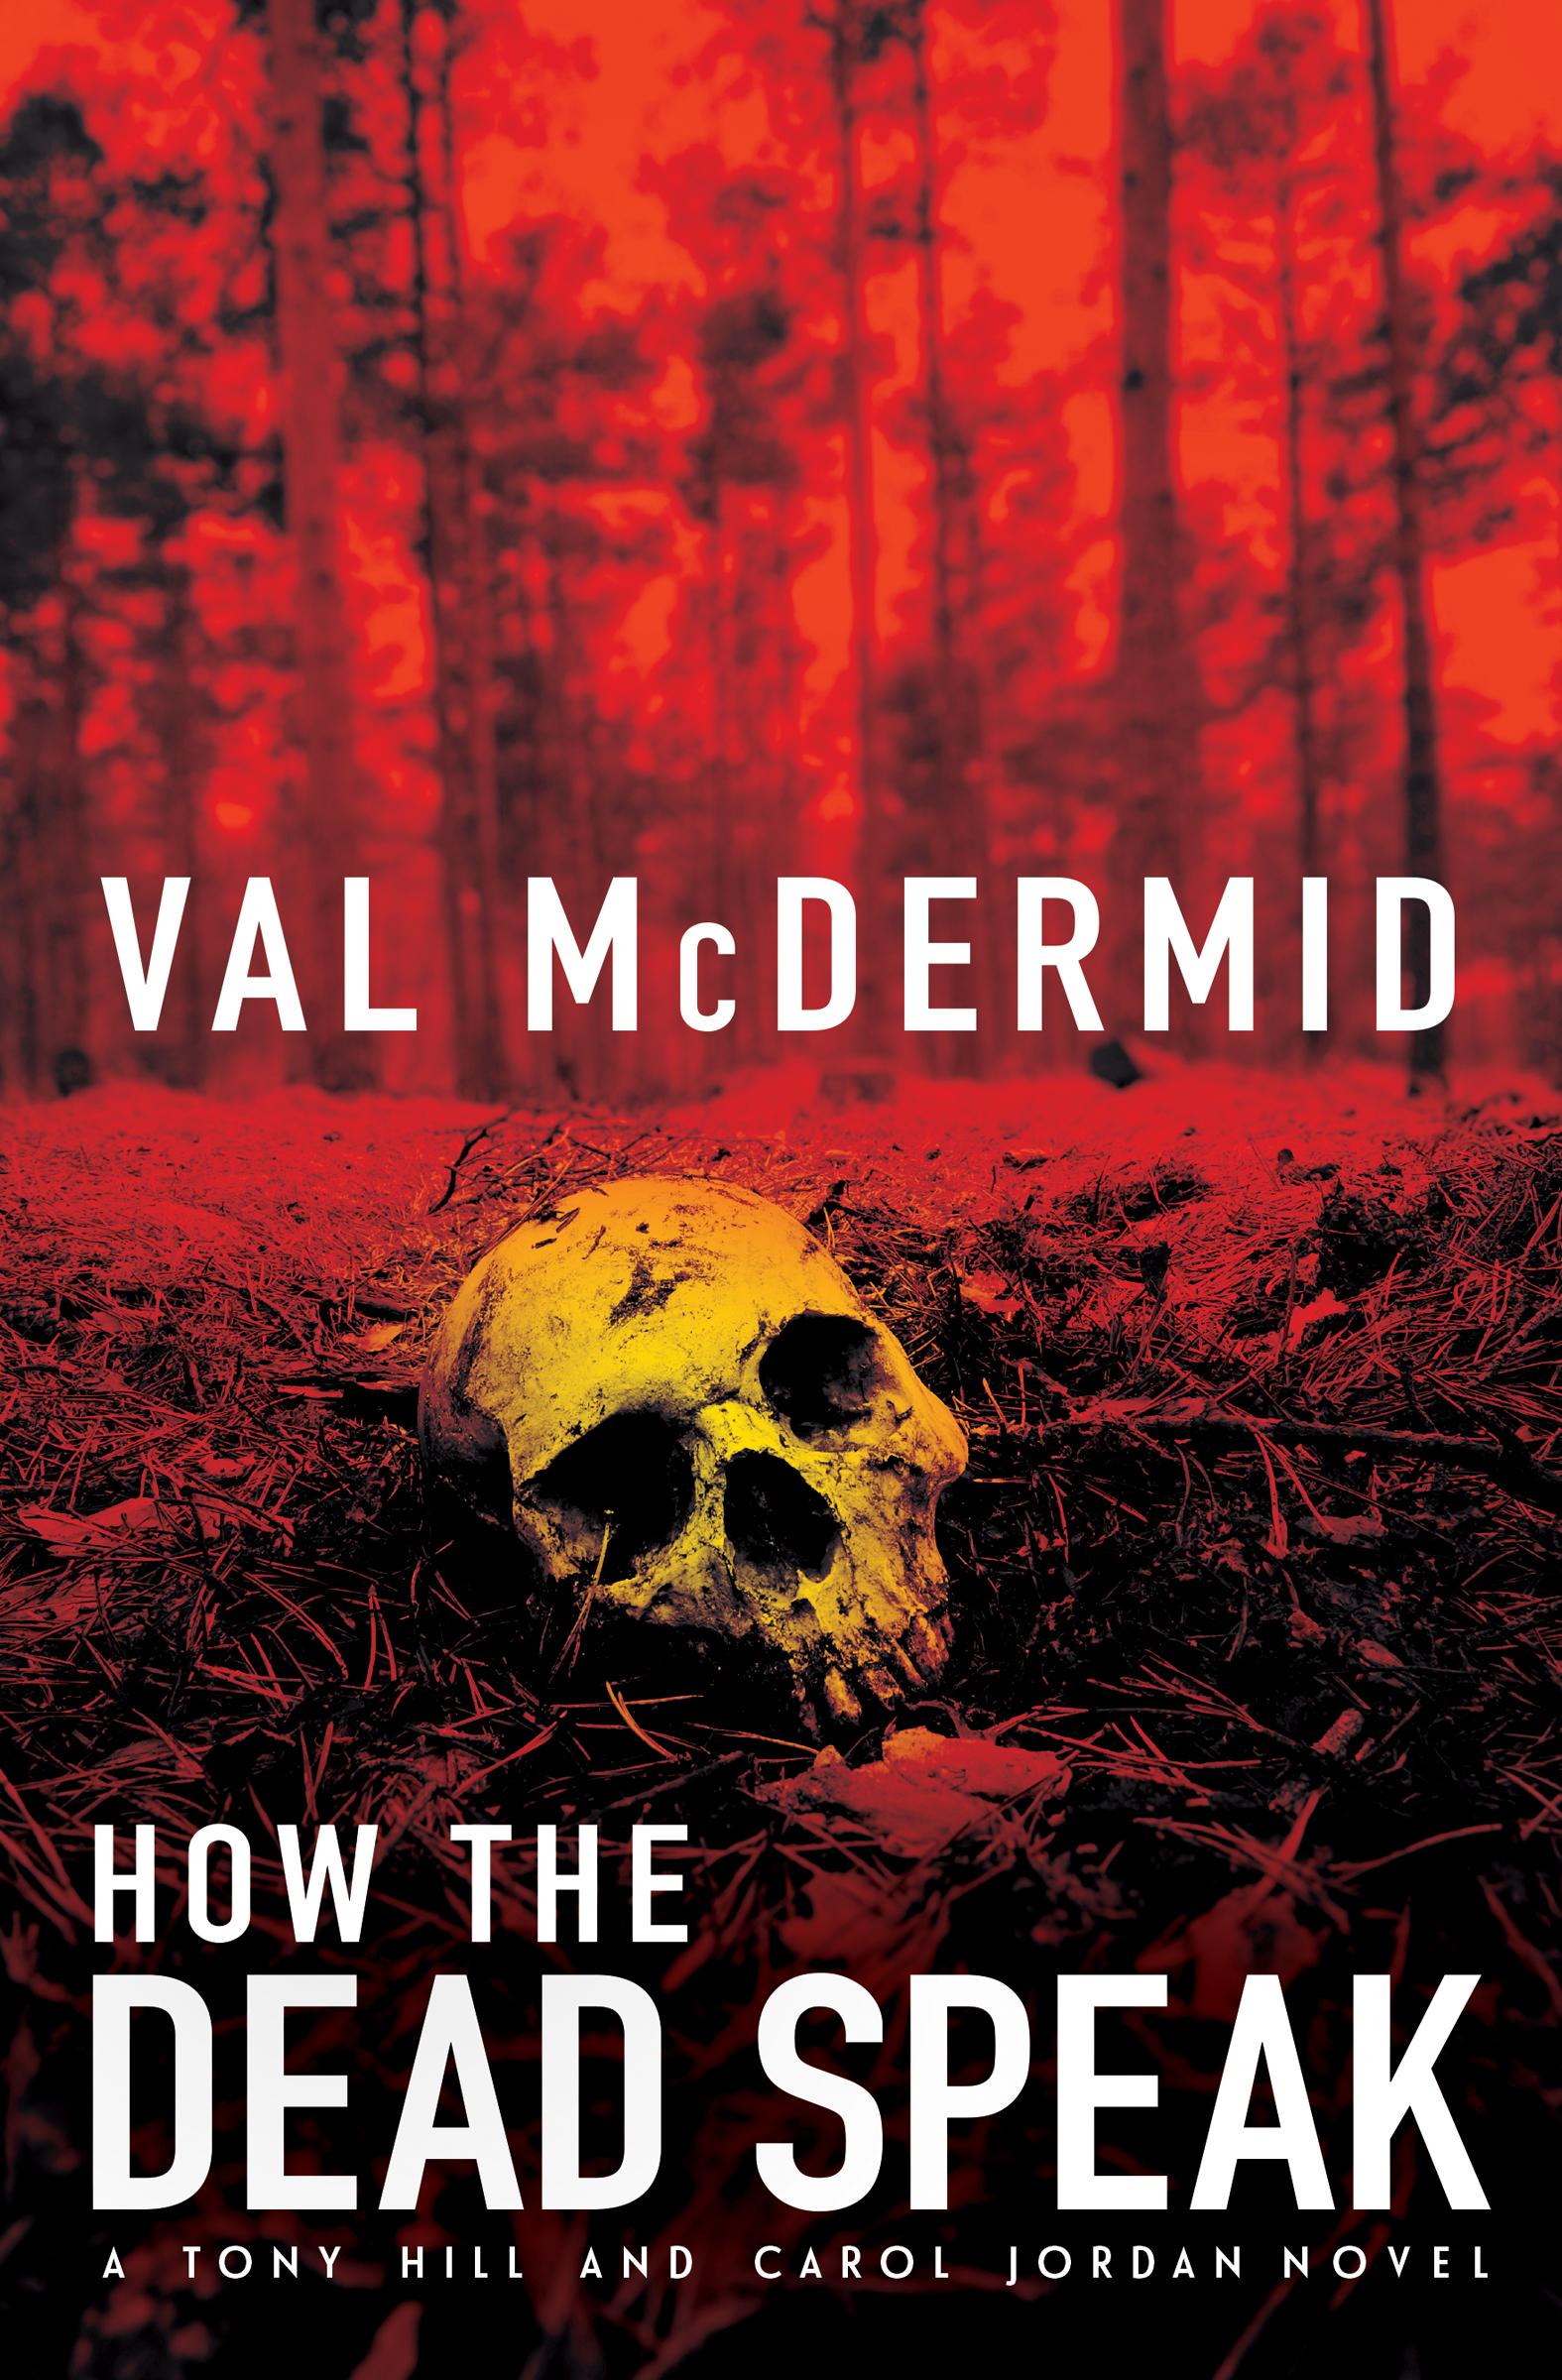 How The Dead Speak A Tony Hill and Carol Jordan Thriller